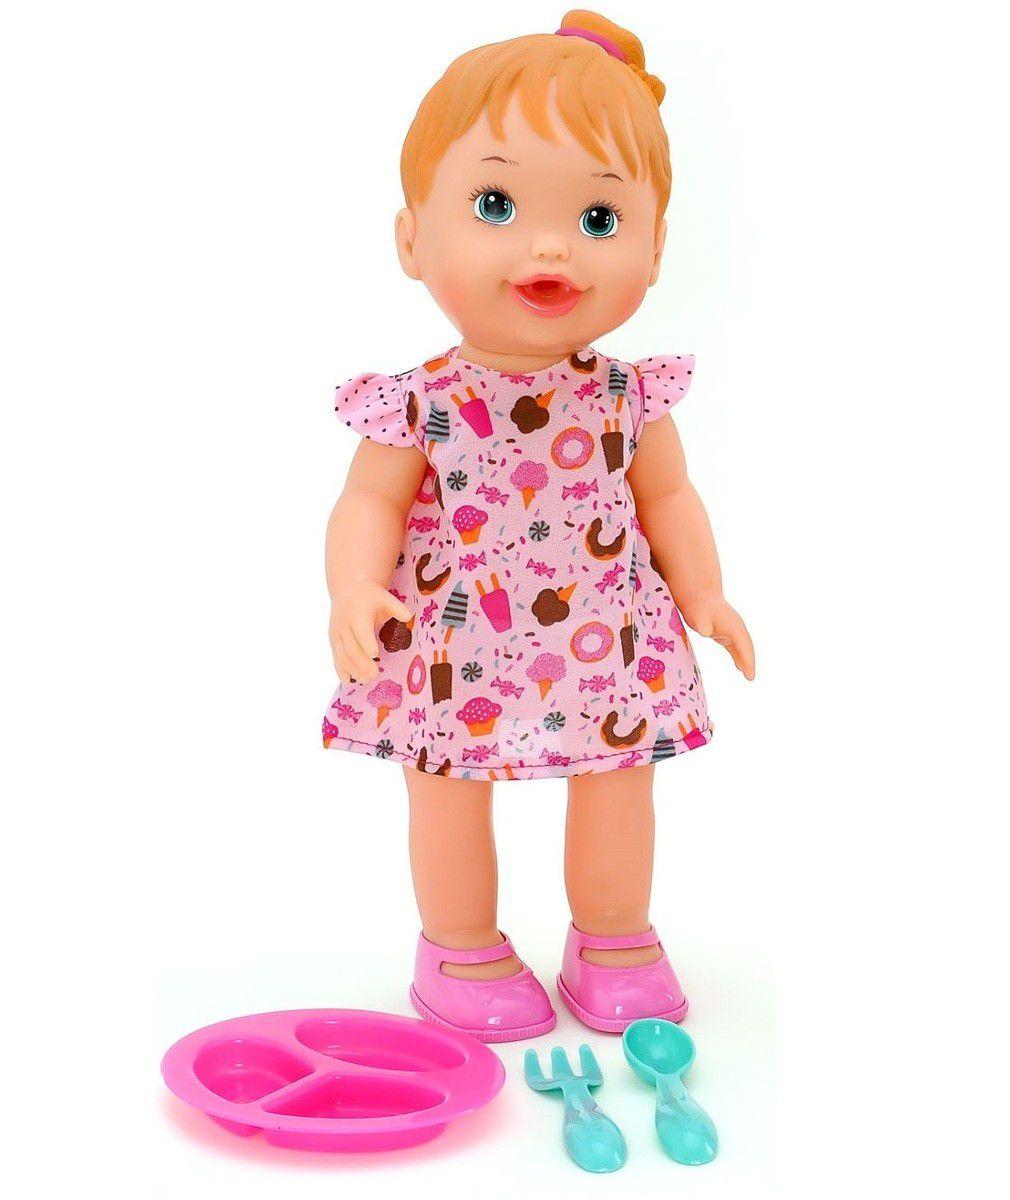 Boneca My Little Collection Lanchinho - Diver Toys